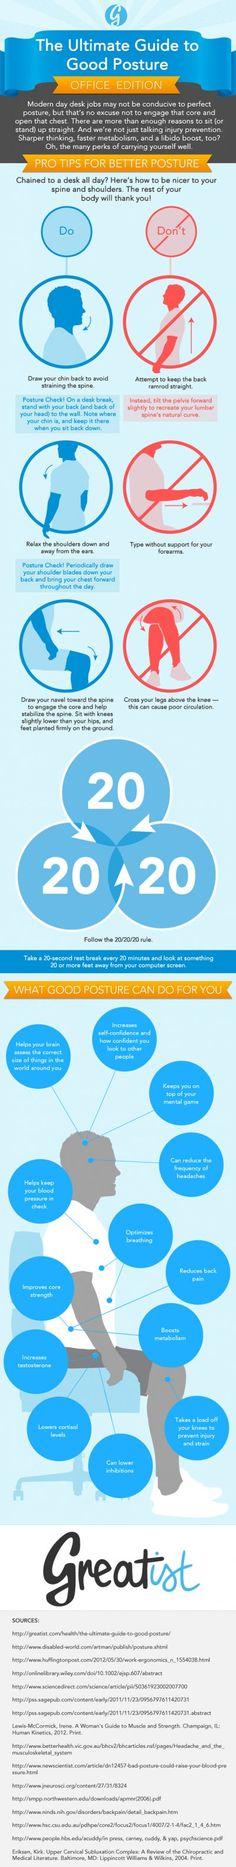 http://www.familyhealthchiropractic.com    Austin Chiropractor Dr Daniel Gonzalez Family Health Chiropractic Austin Texas :: Good Posture At Work